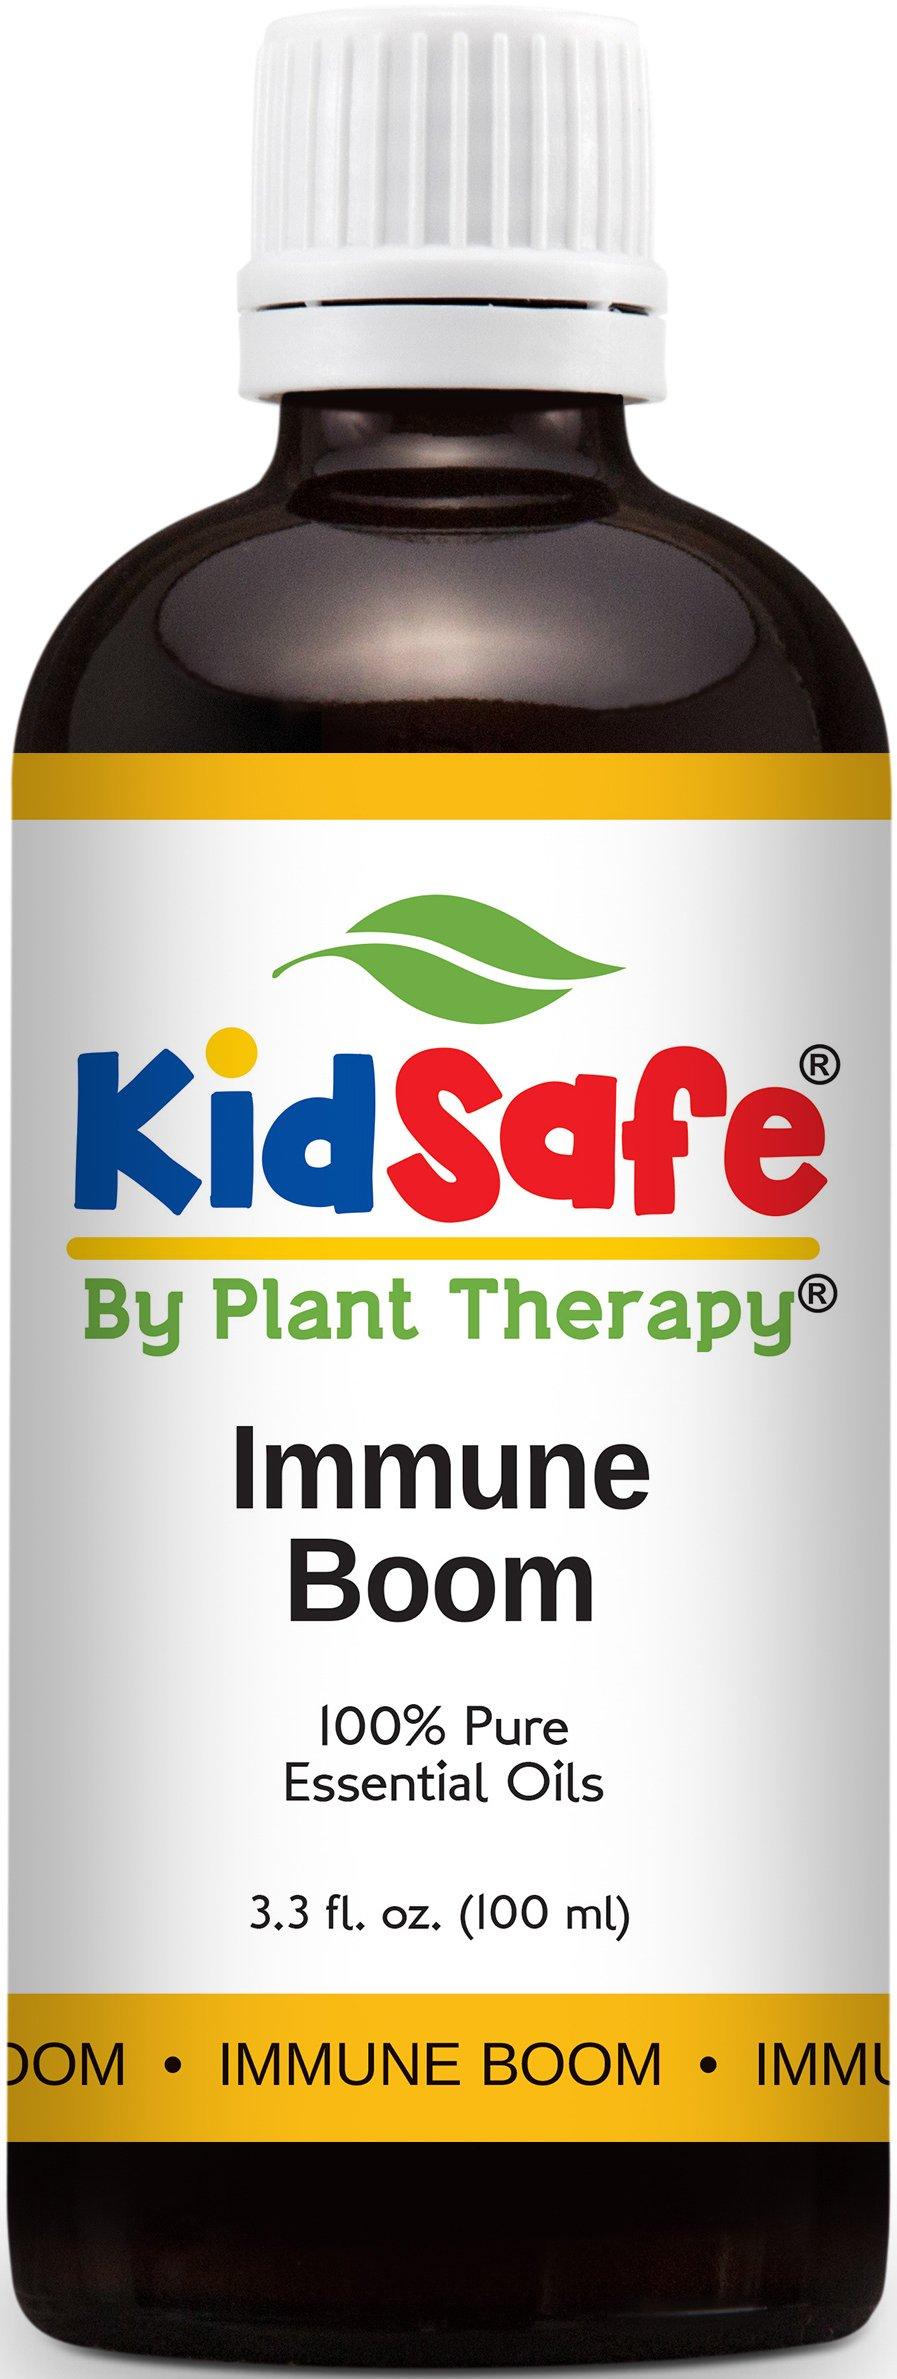 Plant Therapy KidSafe Immune Boom Synergy Essential Oil Blend. Blend of: Lemon, Palmarosa, Dill, Petitgrain, Copaiba and Frankincense Carteri. 100 mL (3.3 Ounce).